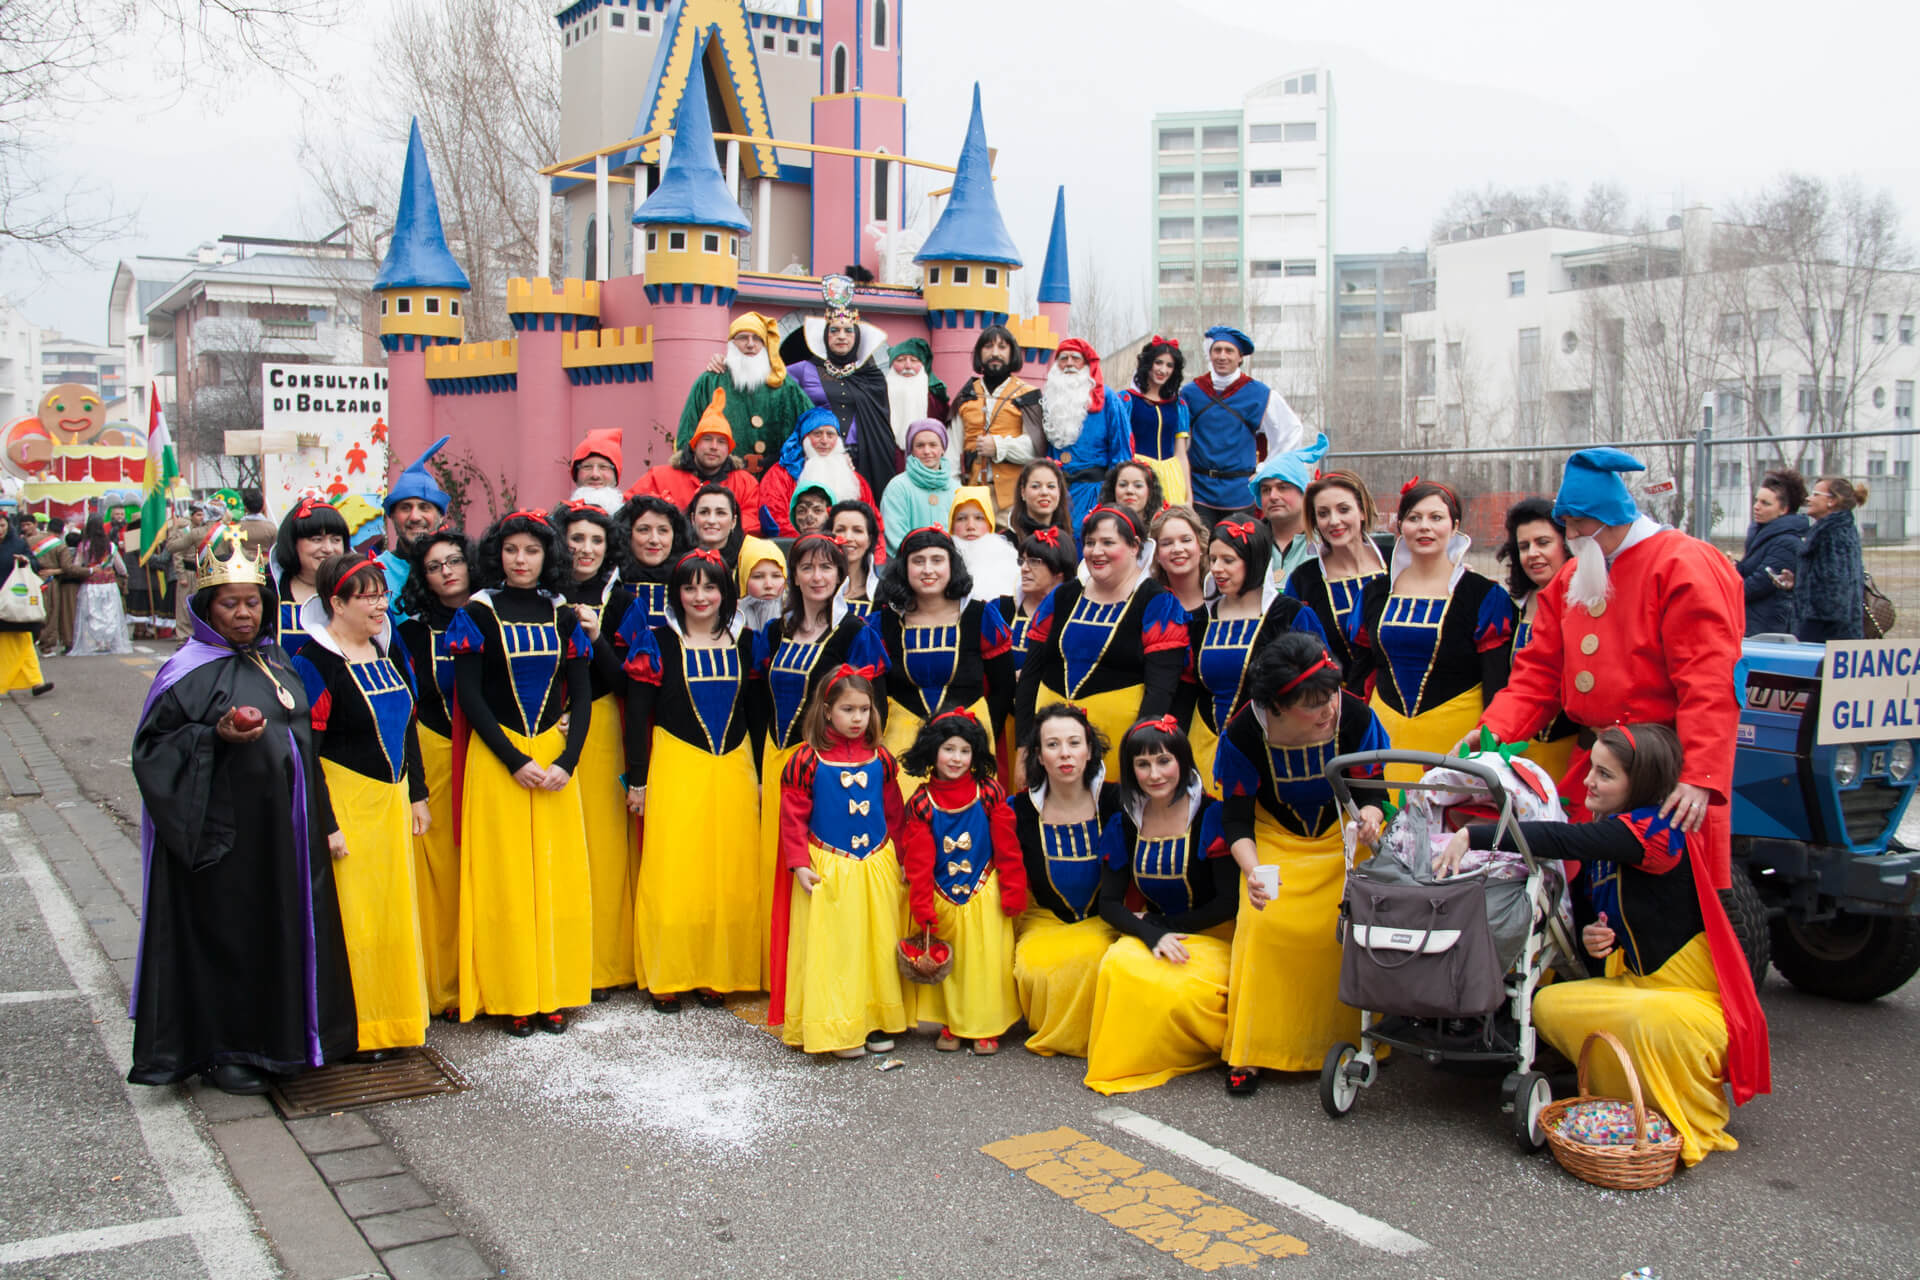 Biancaneve e gli altri nani 2015 Gruppo Carnevalesco